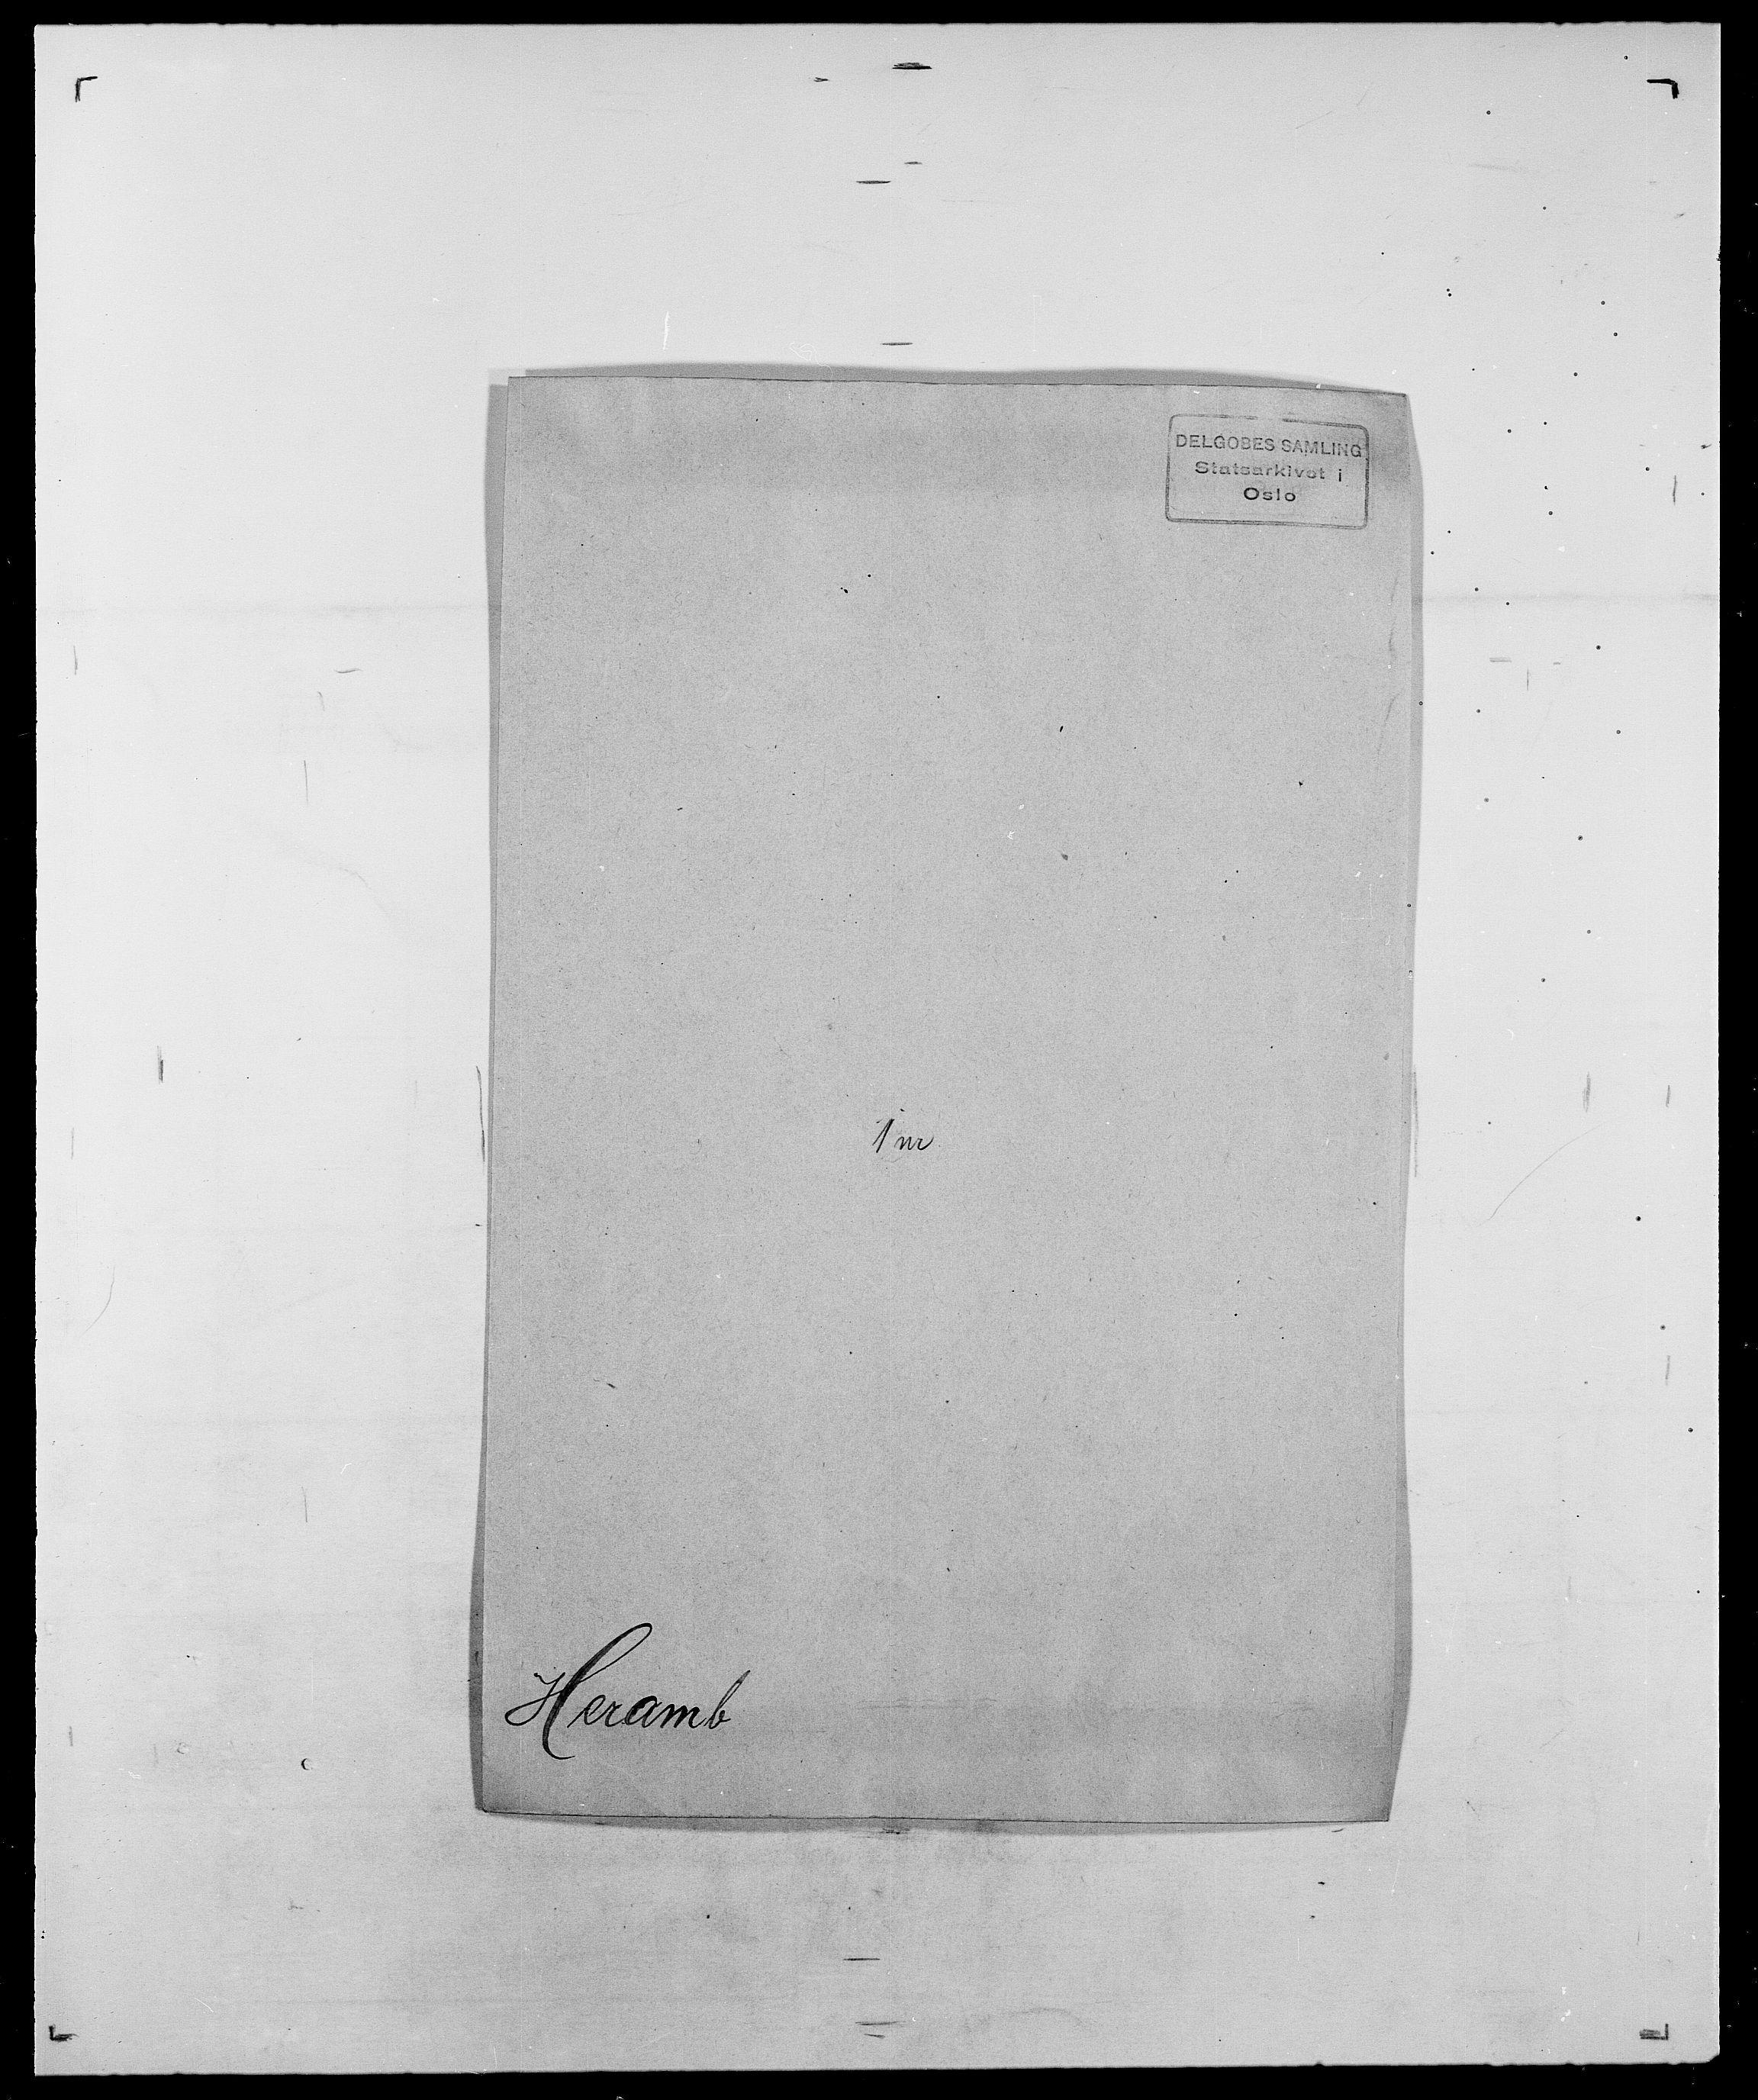 SAO, Delgobe, Charles Antoine - samling, D/Da/L0017: Helander - Hjørne, s. 217